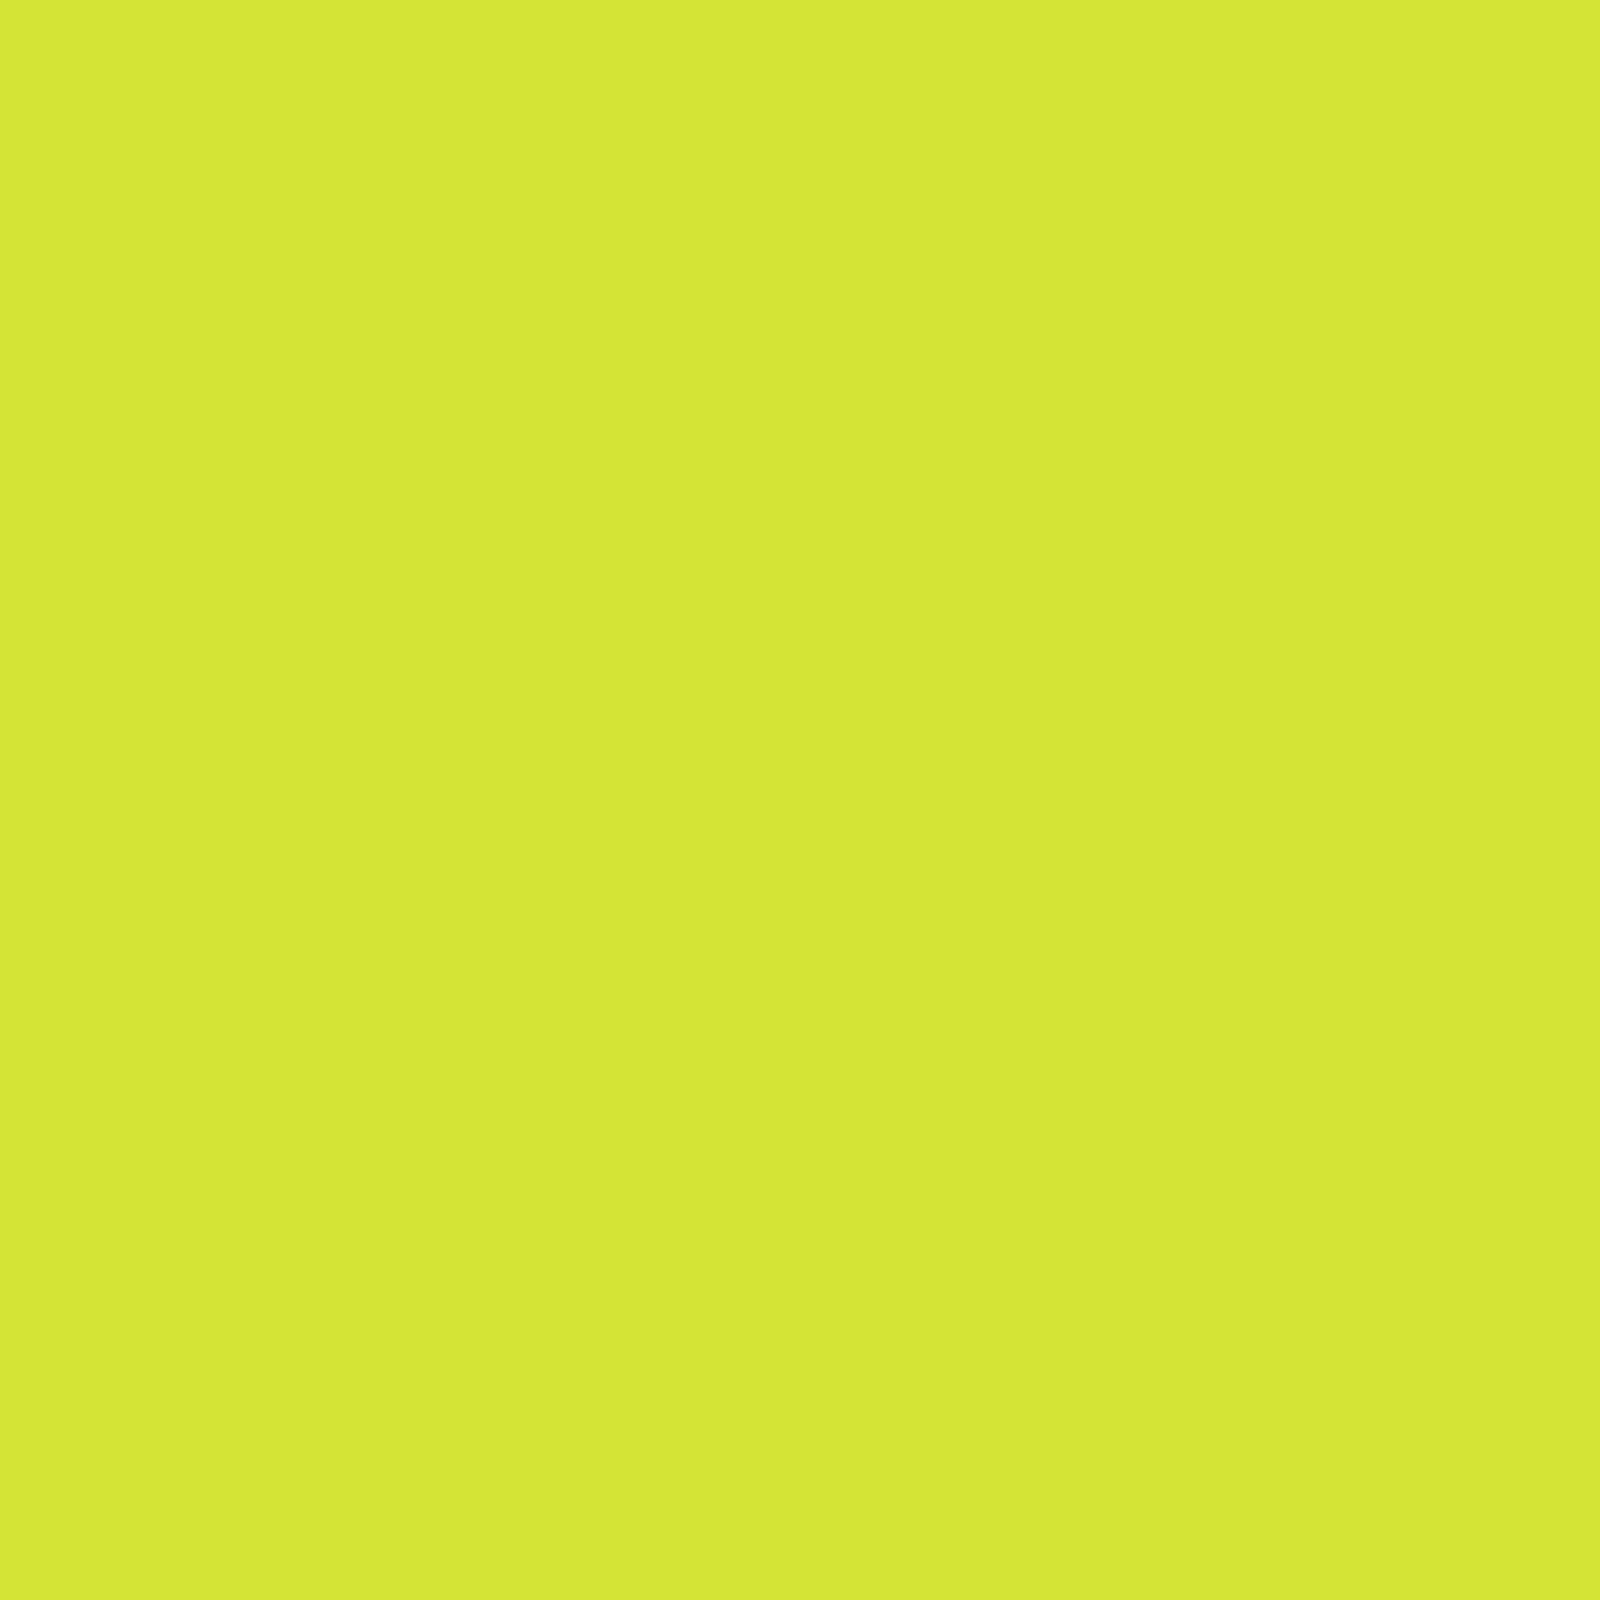 kobra verde lamai